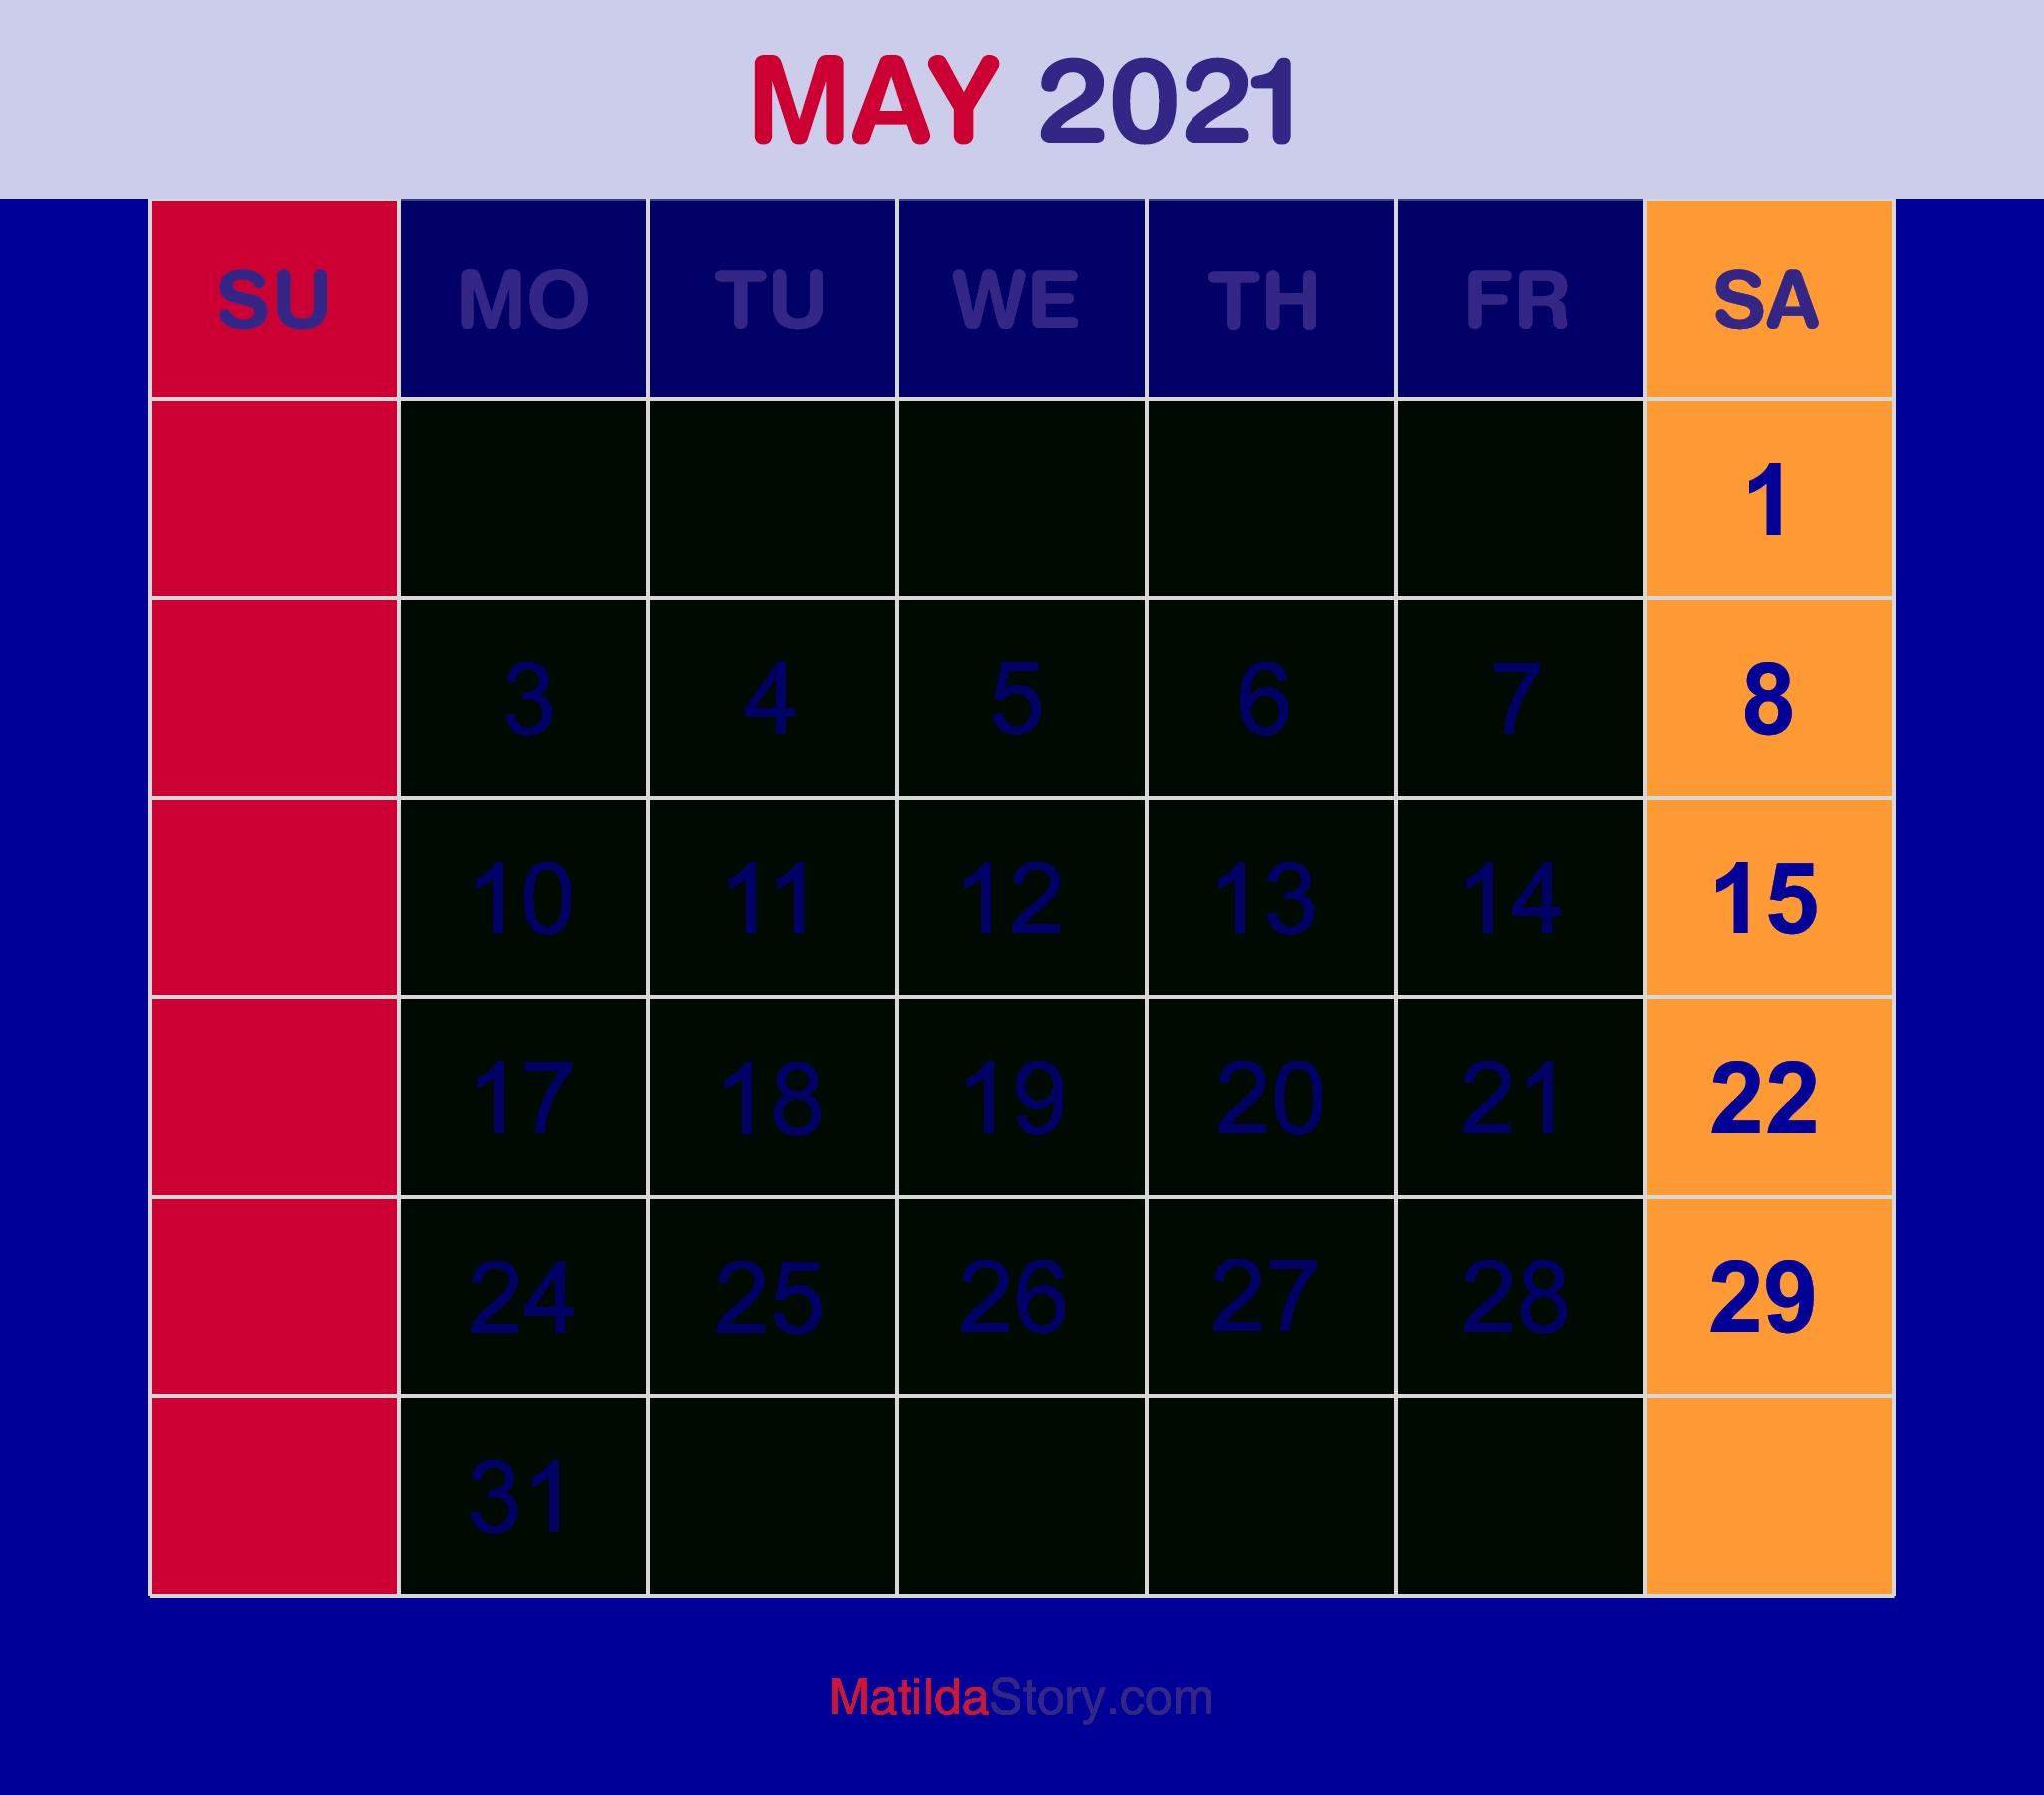 May 2021 Monthly Calendar, Monthly Planner, Printable Free - Sunday Start - Matildastory